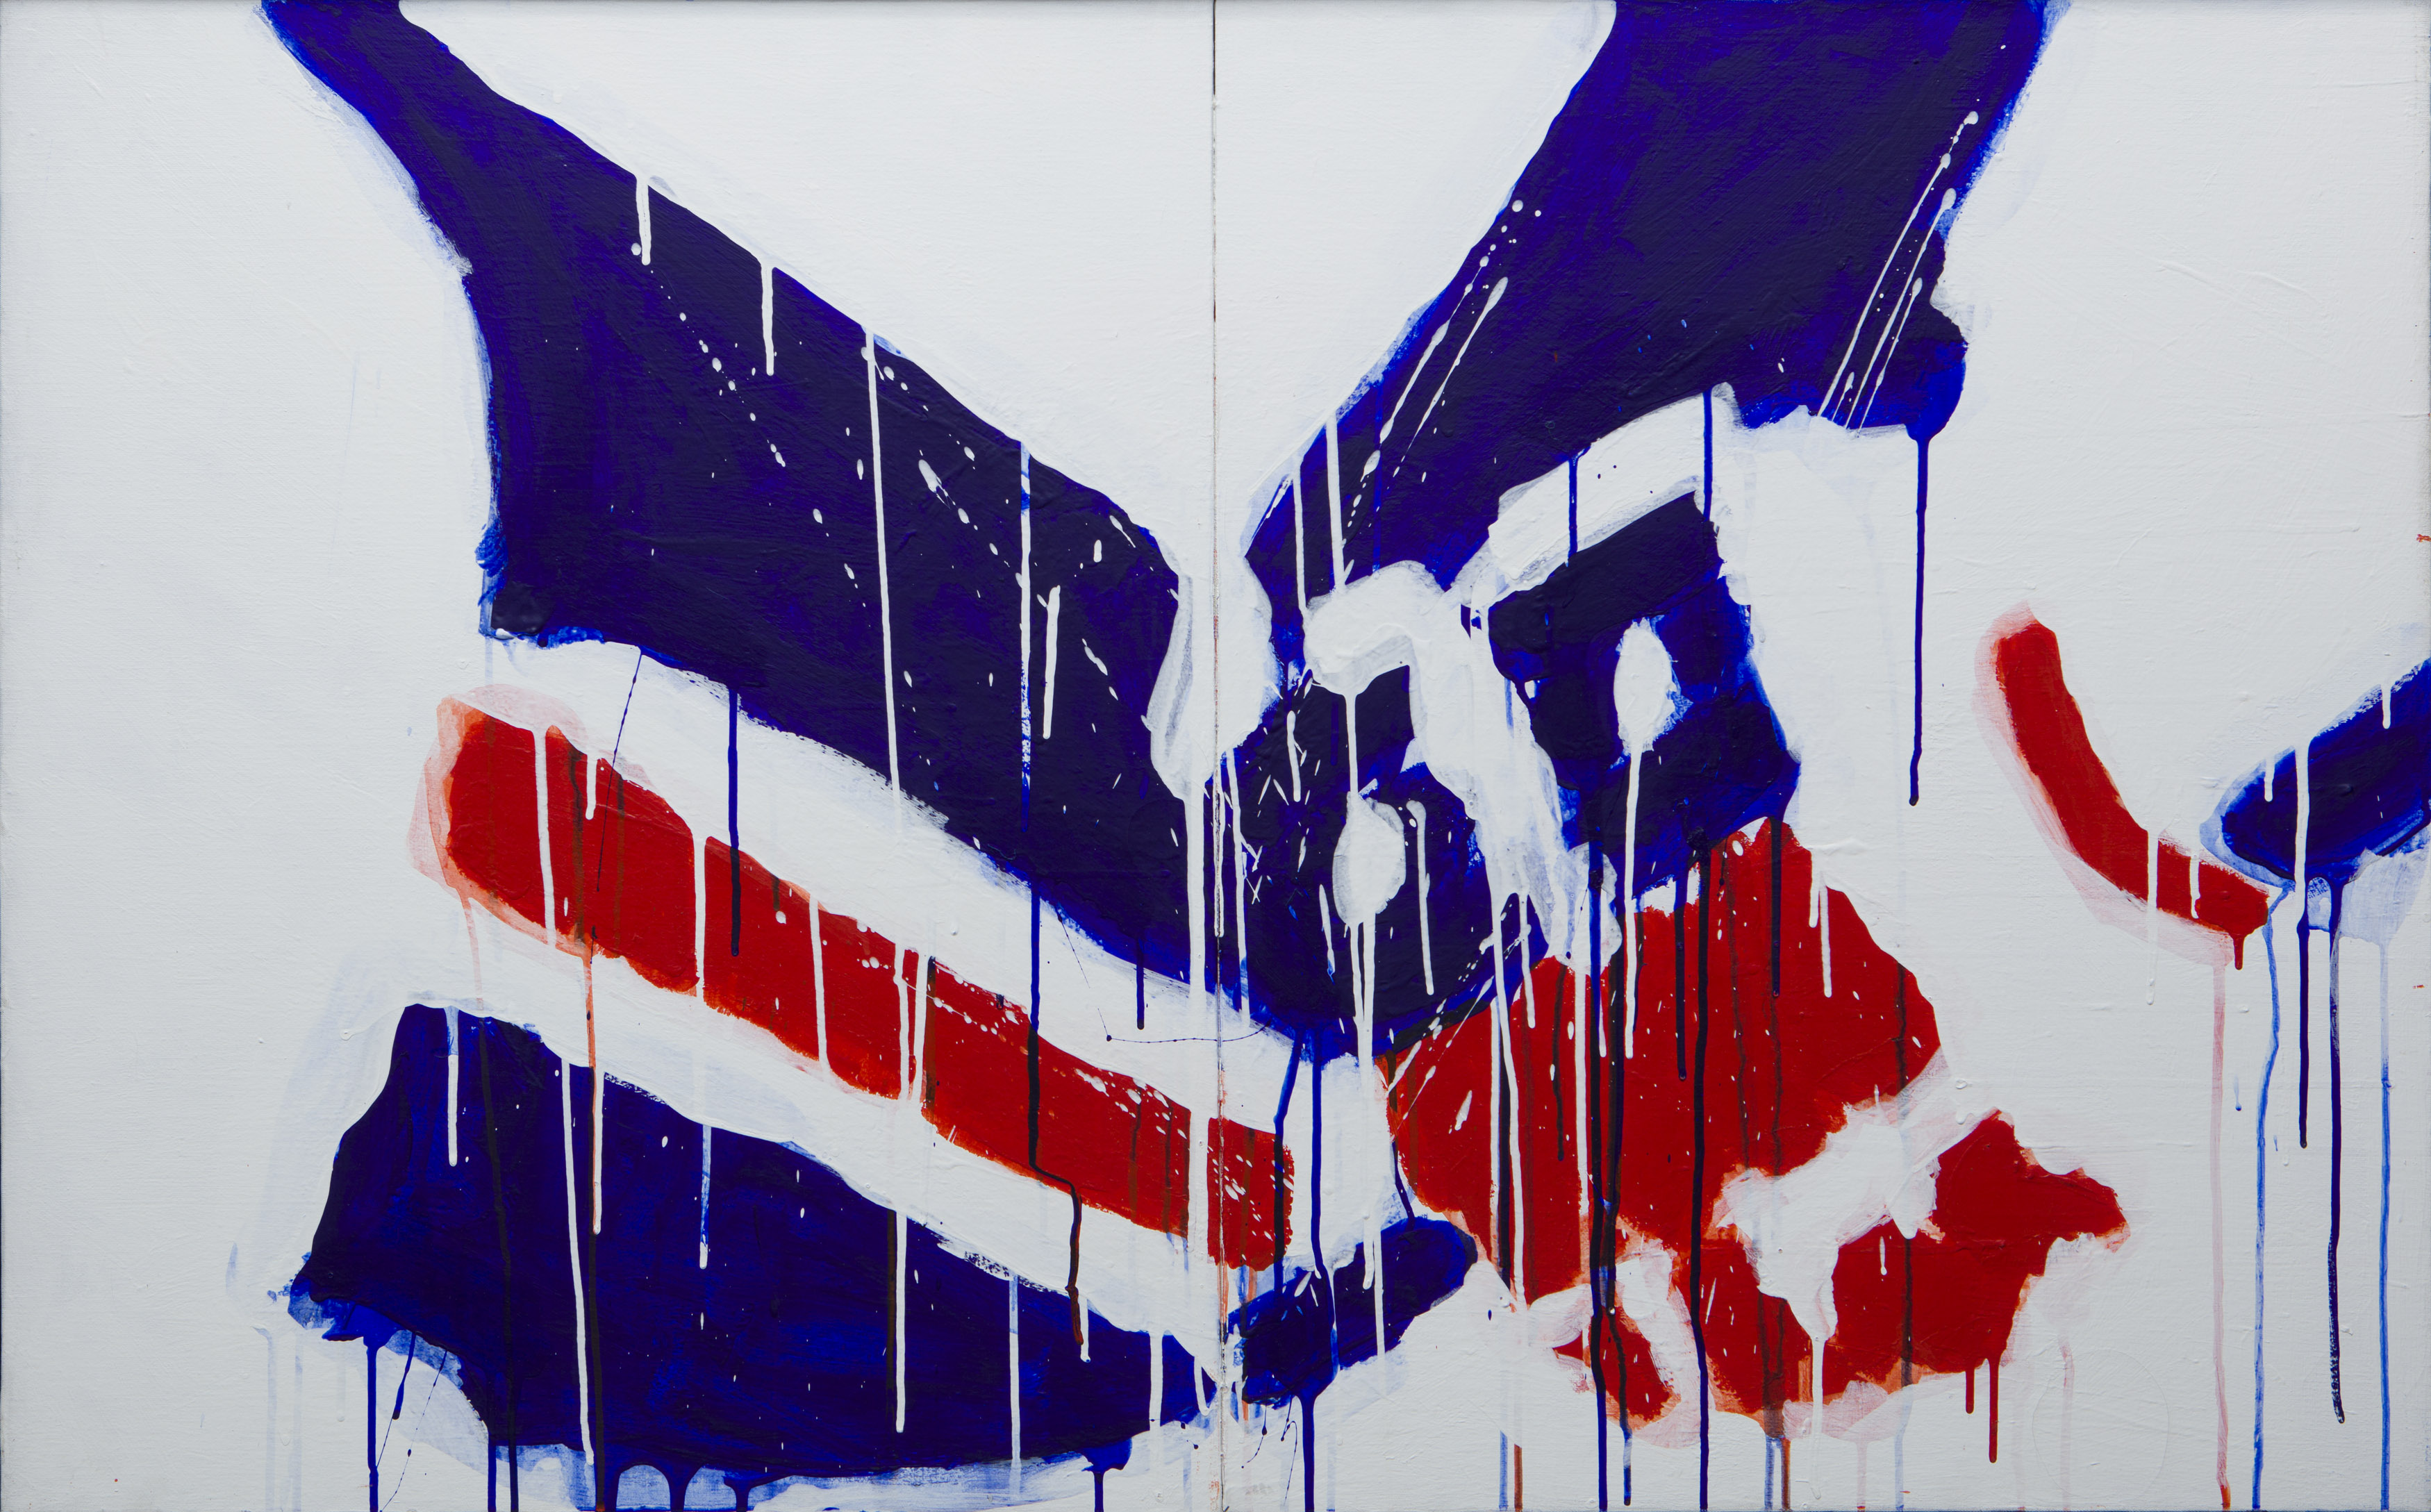 Serge Lemoyne - Peinture no 3 (série Bleu, Blanc, Rouge) - BYDealers